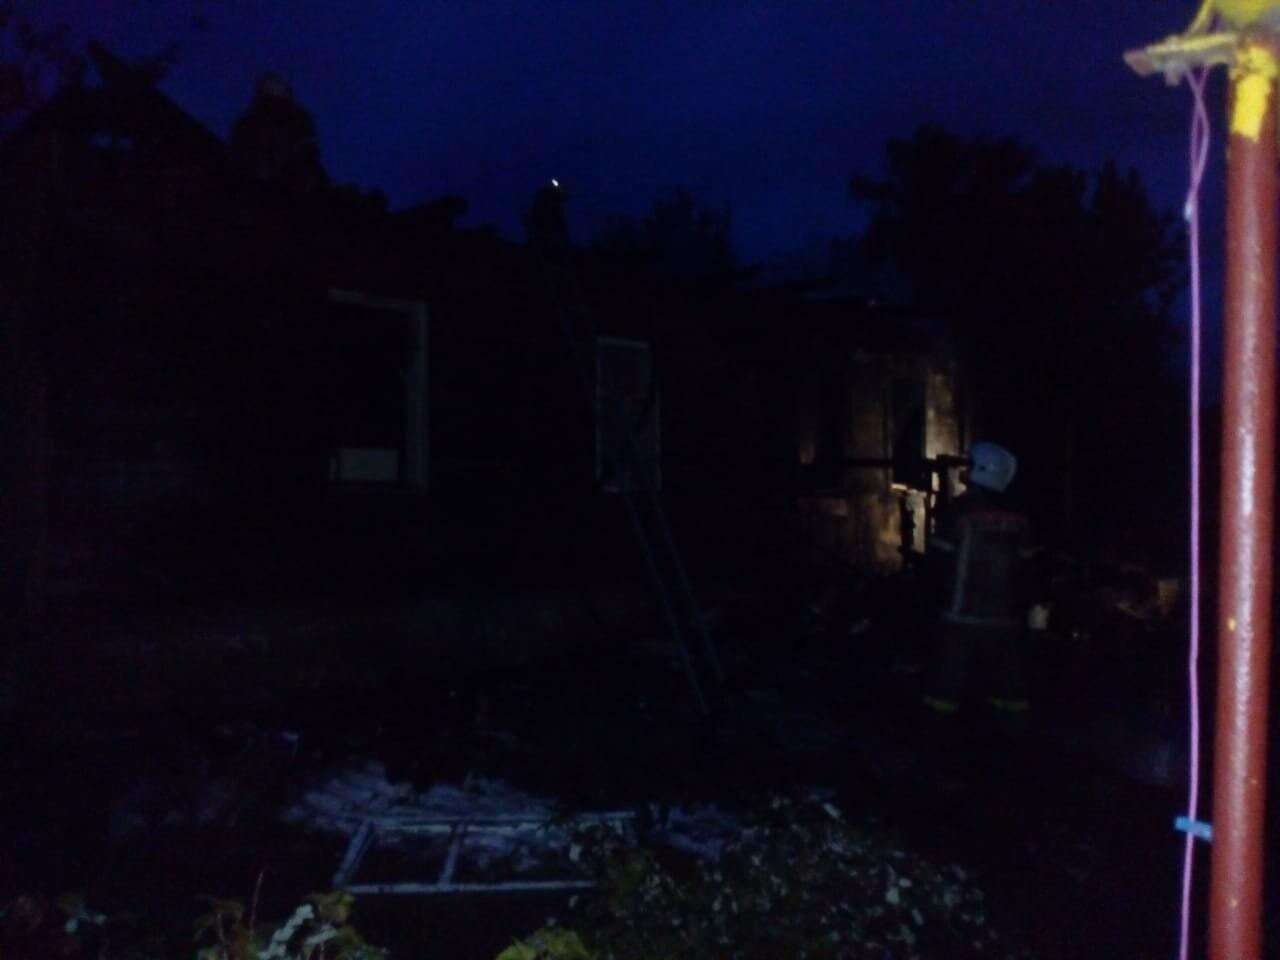 Под Тамбовом при пожаре погибли 4 человека: среди них 4-летний ребенок. ВИДЕО, фото-9